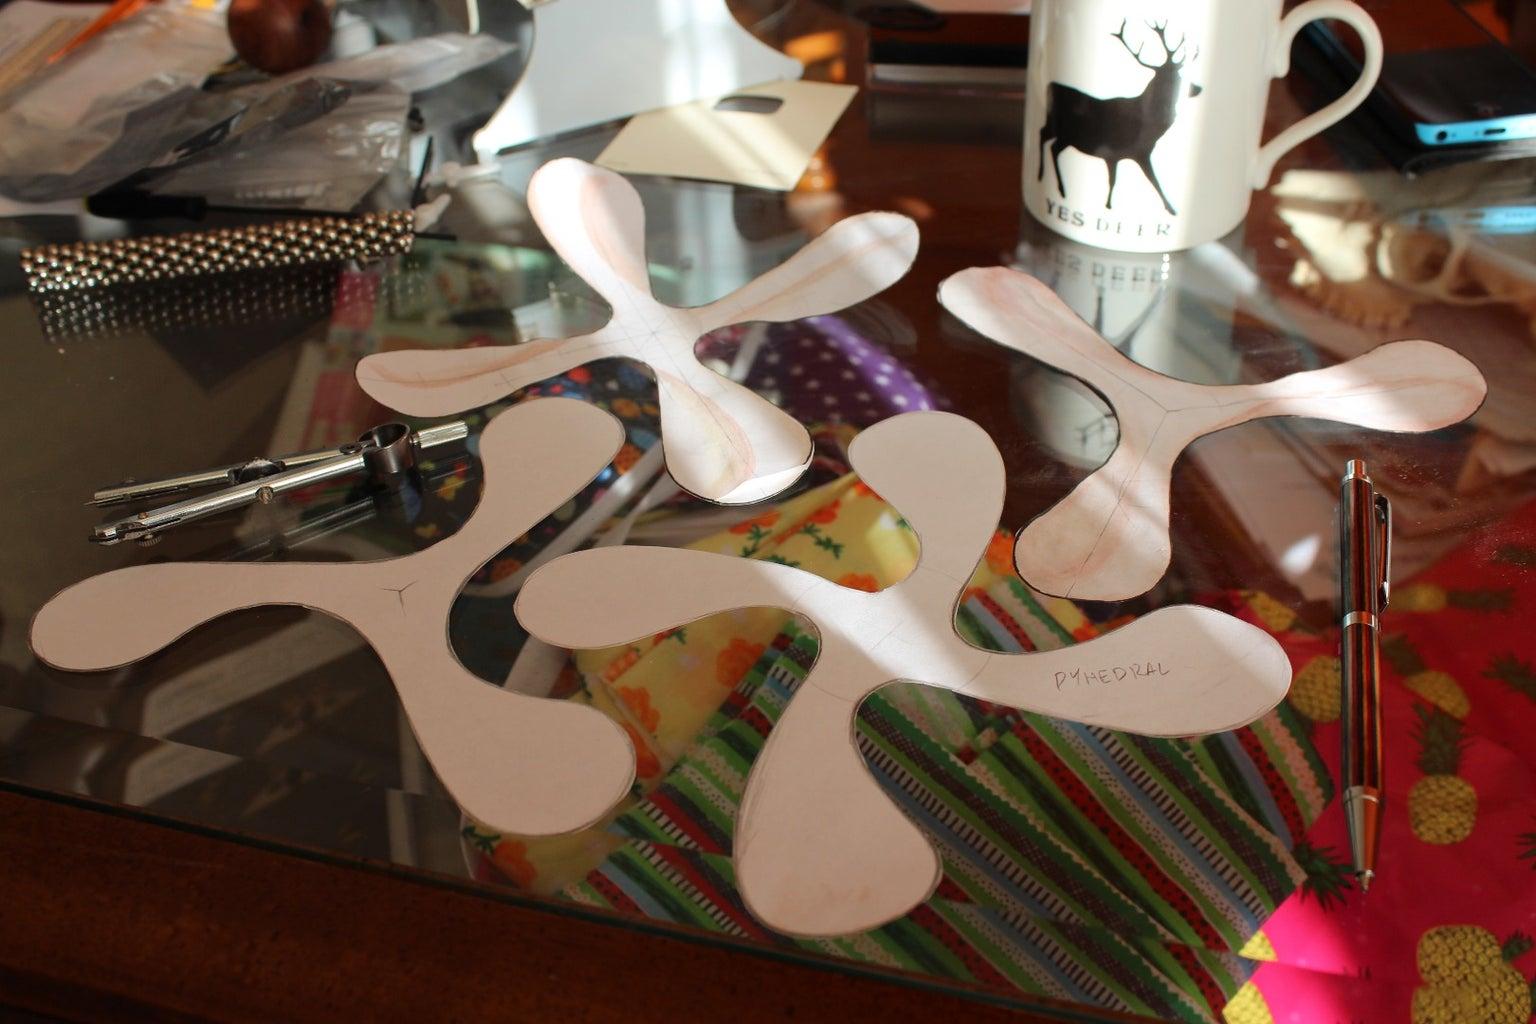 Designing the Experimental Boomerangs